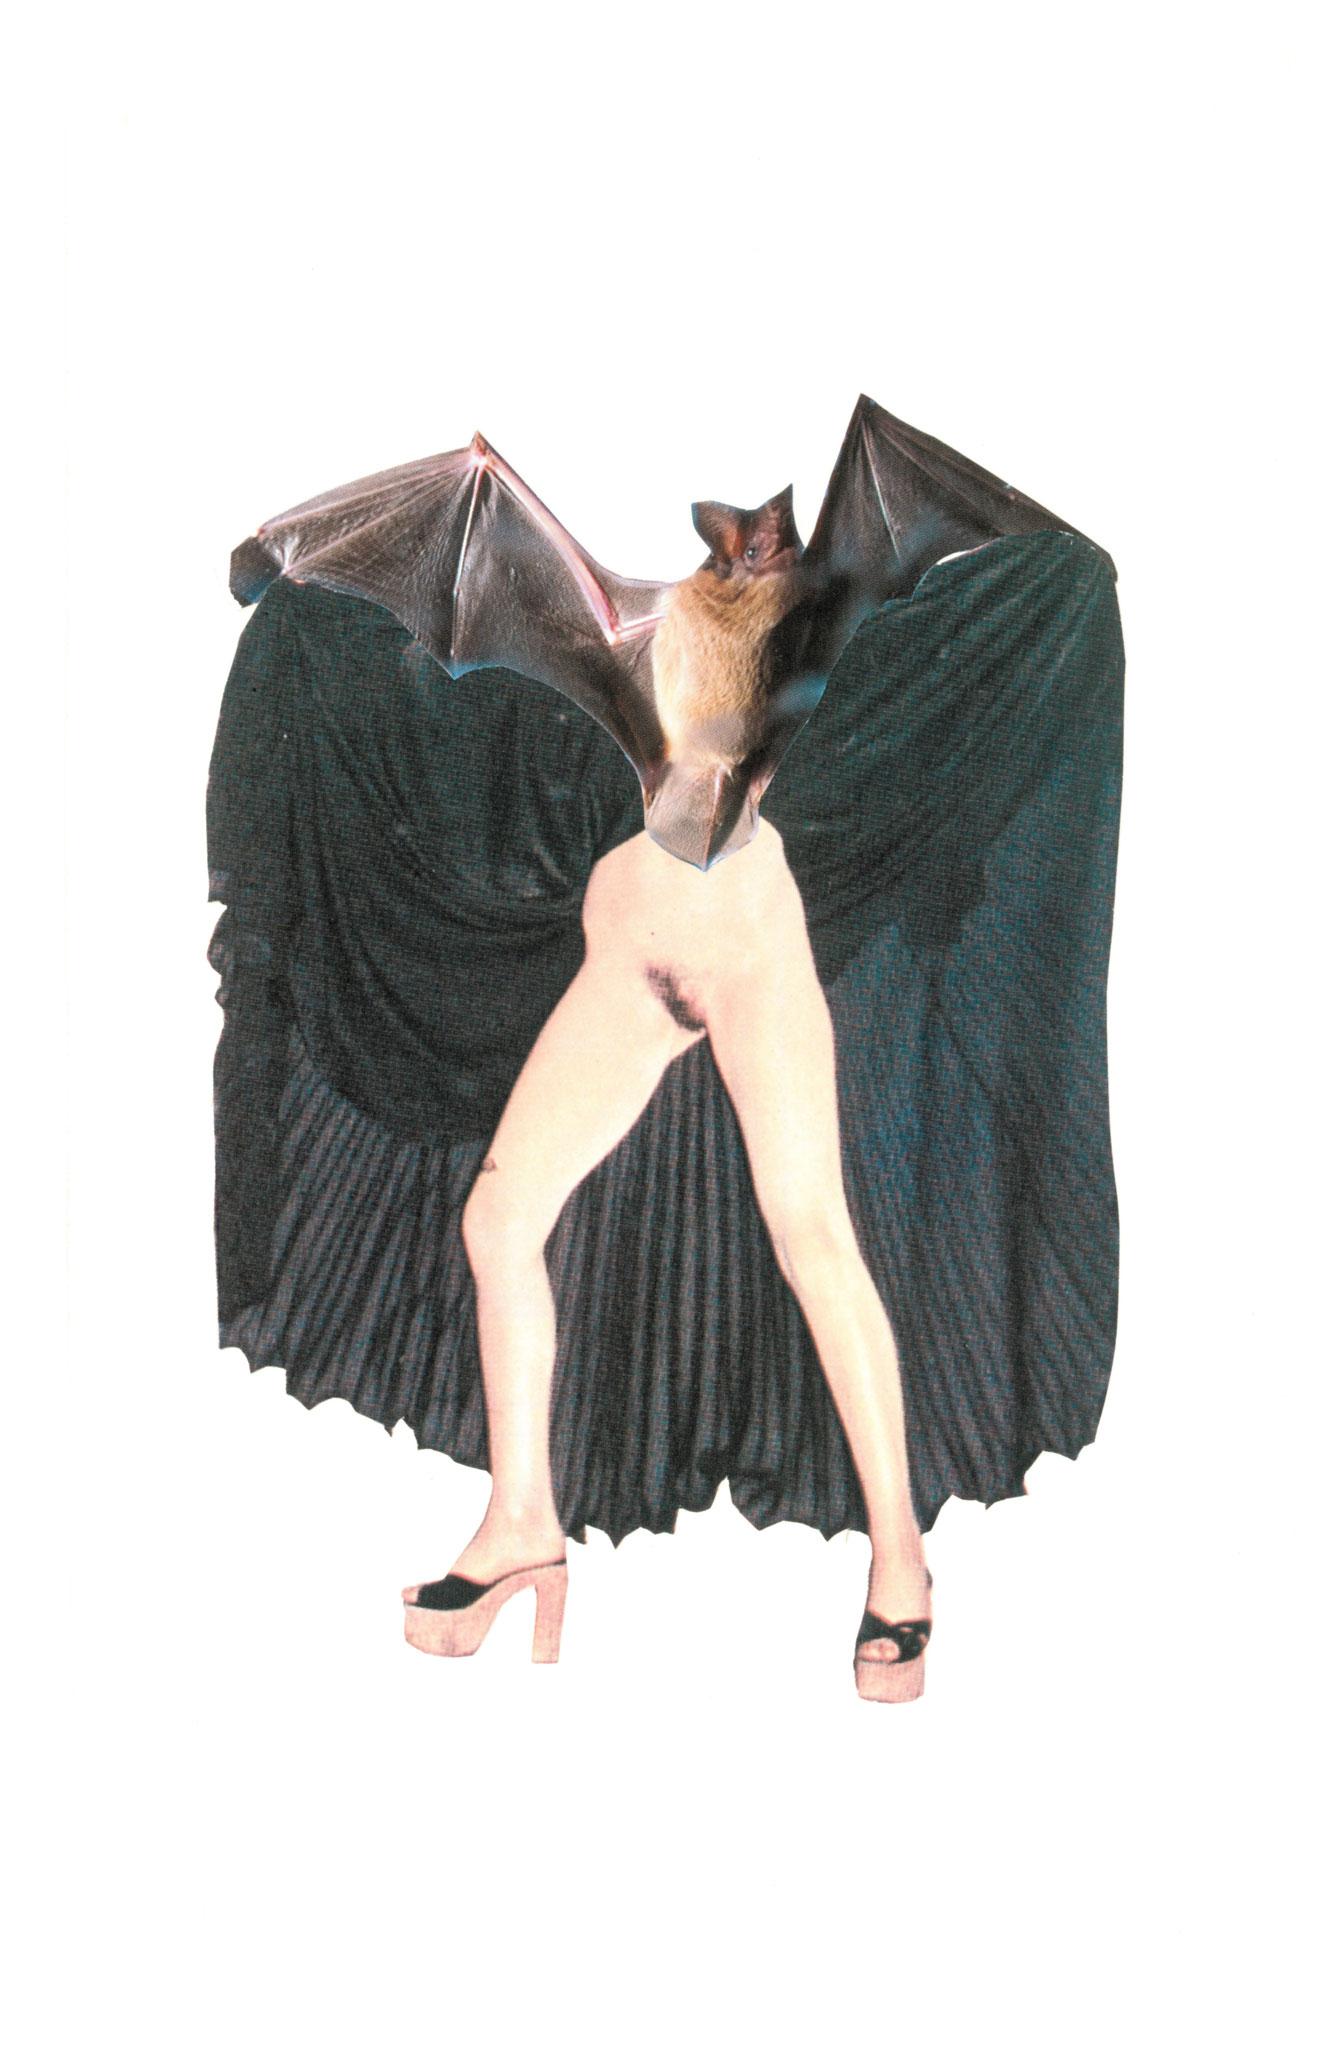 Bat chatte, 13x21cm, 2017